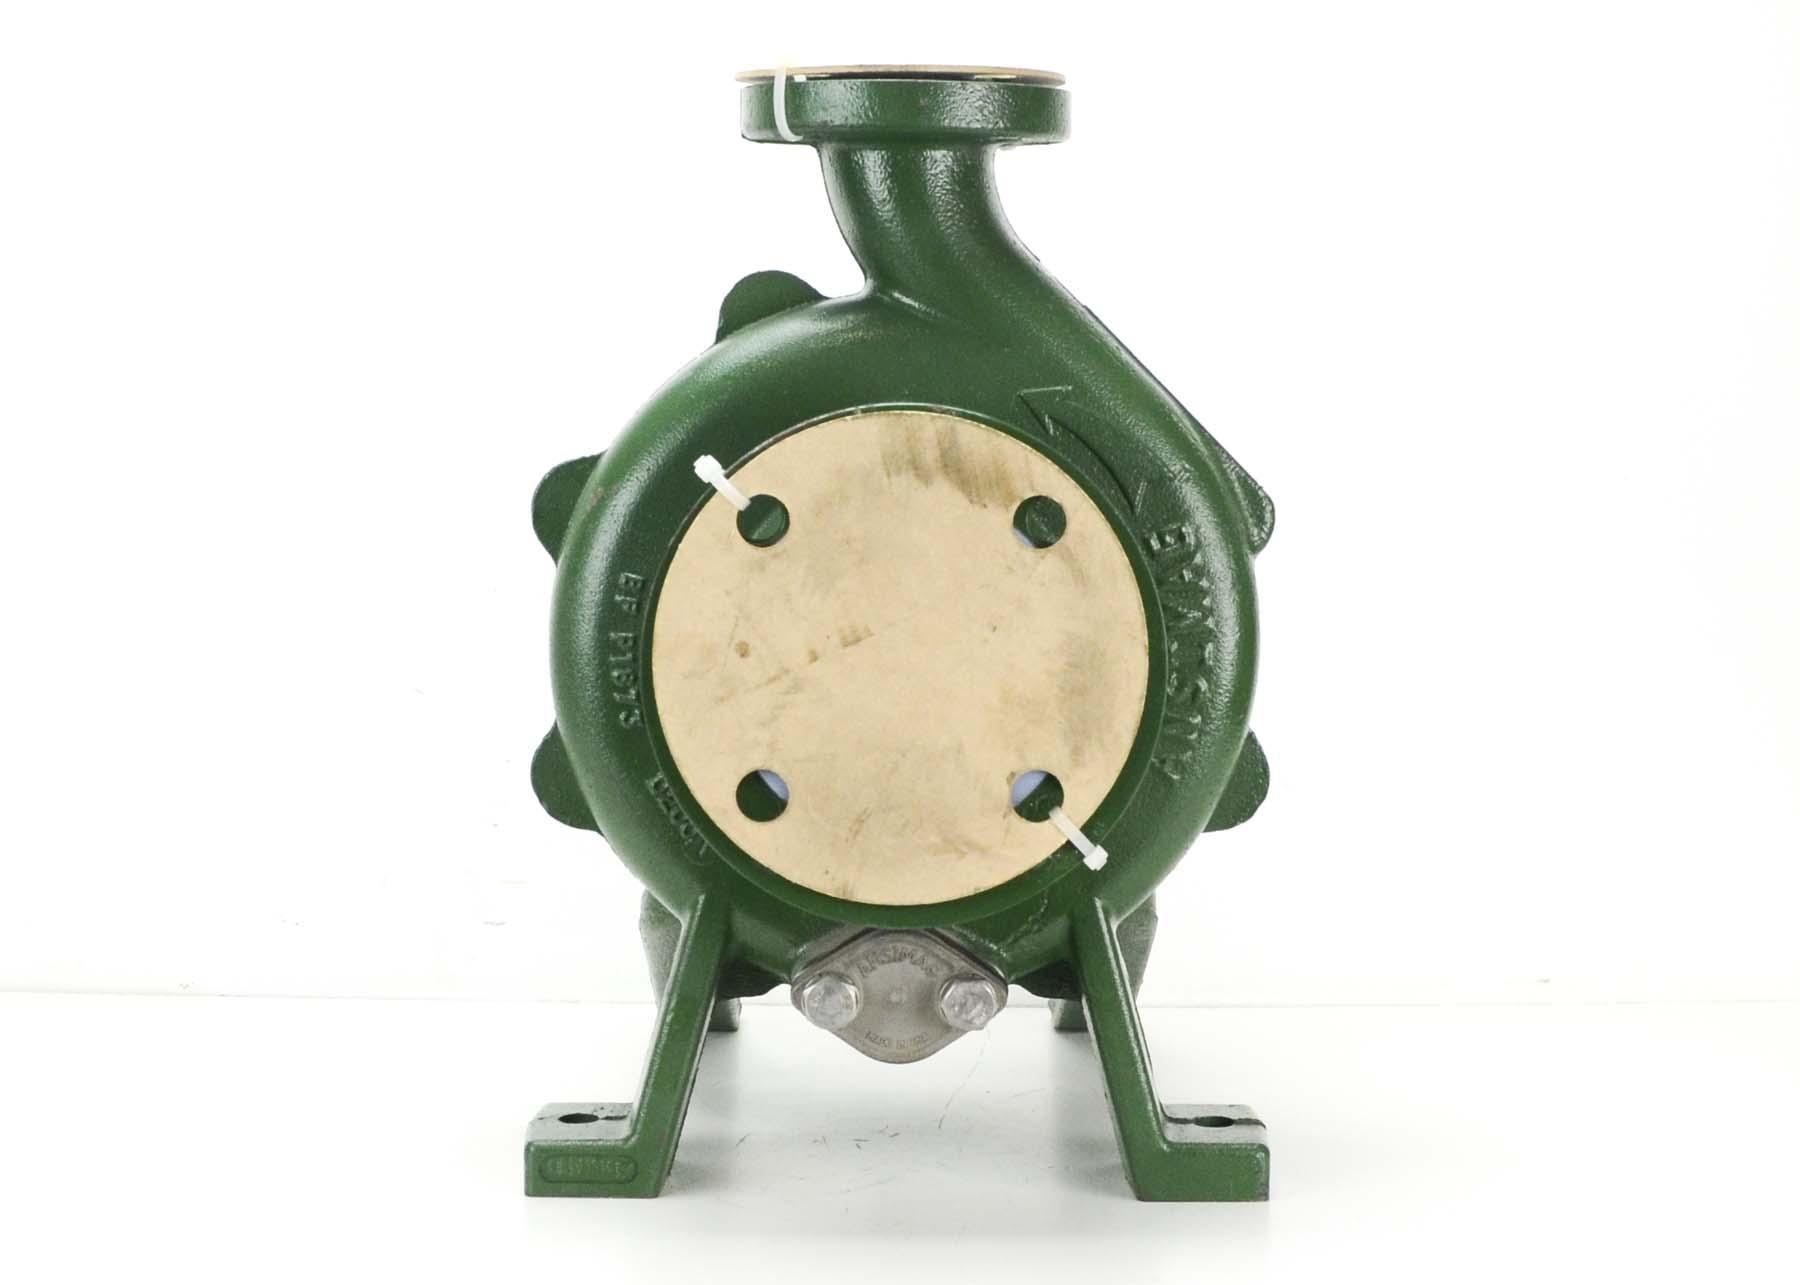 Ansimag K3158CA Pump